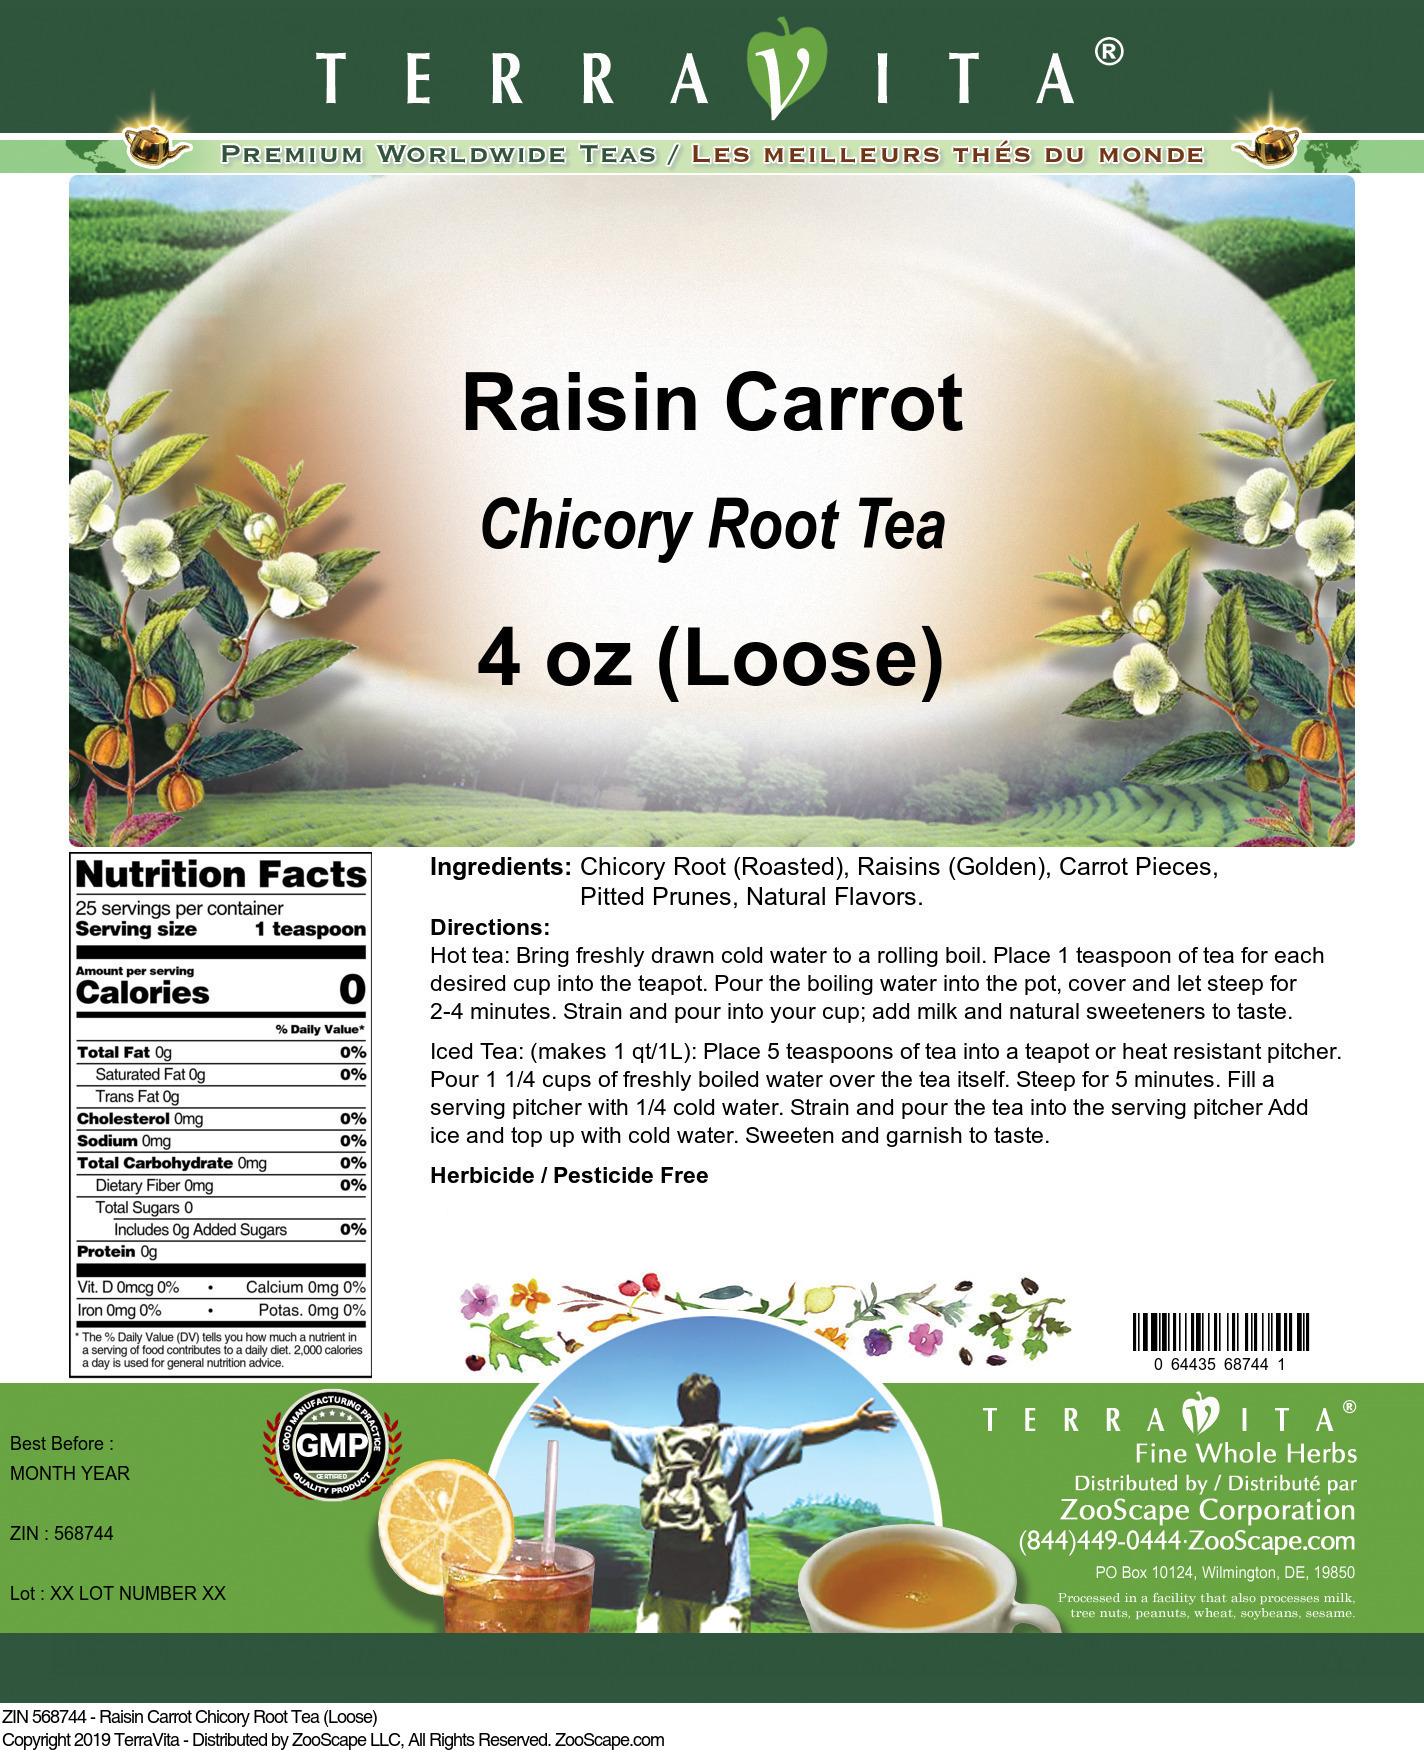 Raisin Carrot Chicory Root Tea (Loose)